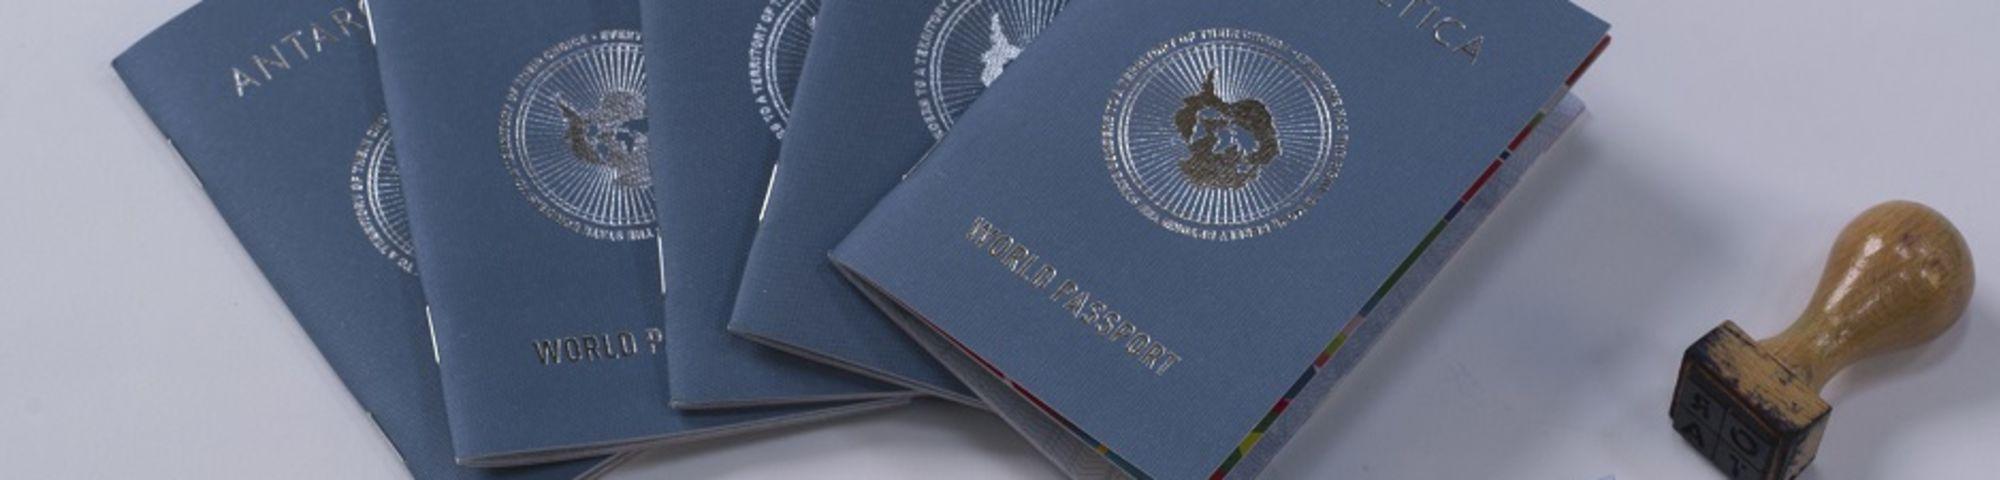 5080_Antarctica World Passport Courtesy of Frieze Projects and Studio Orta